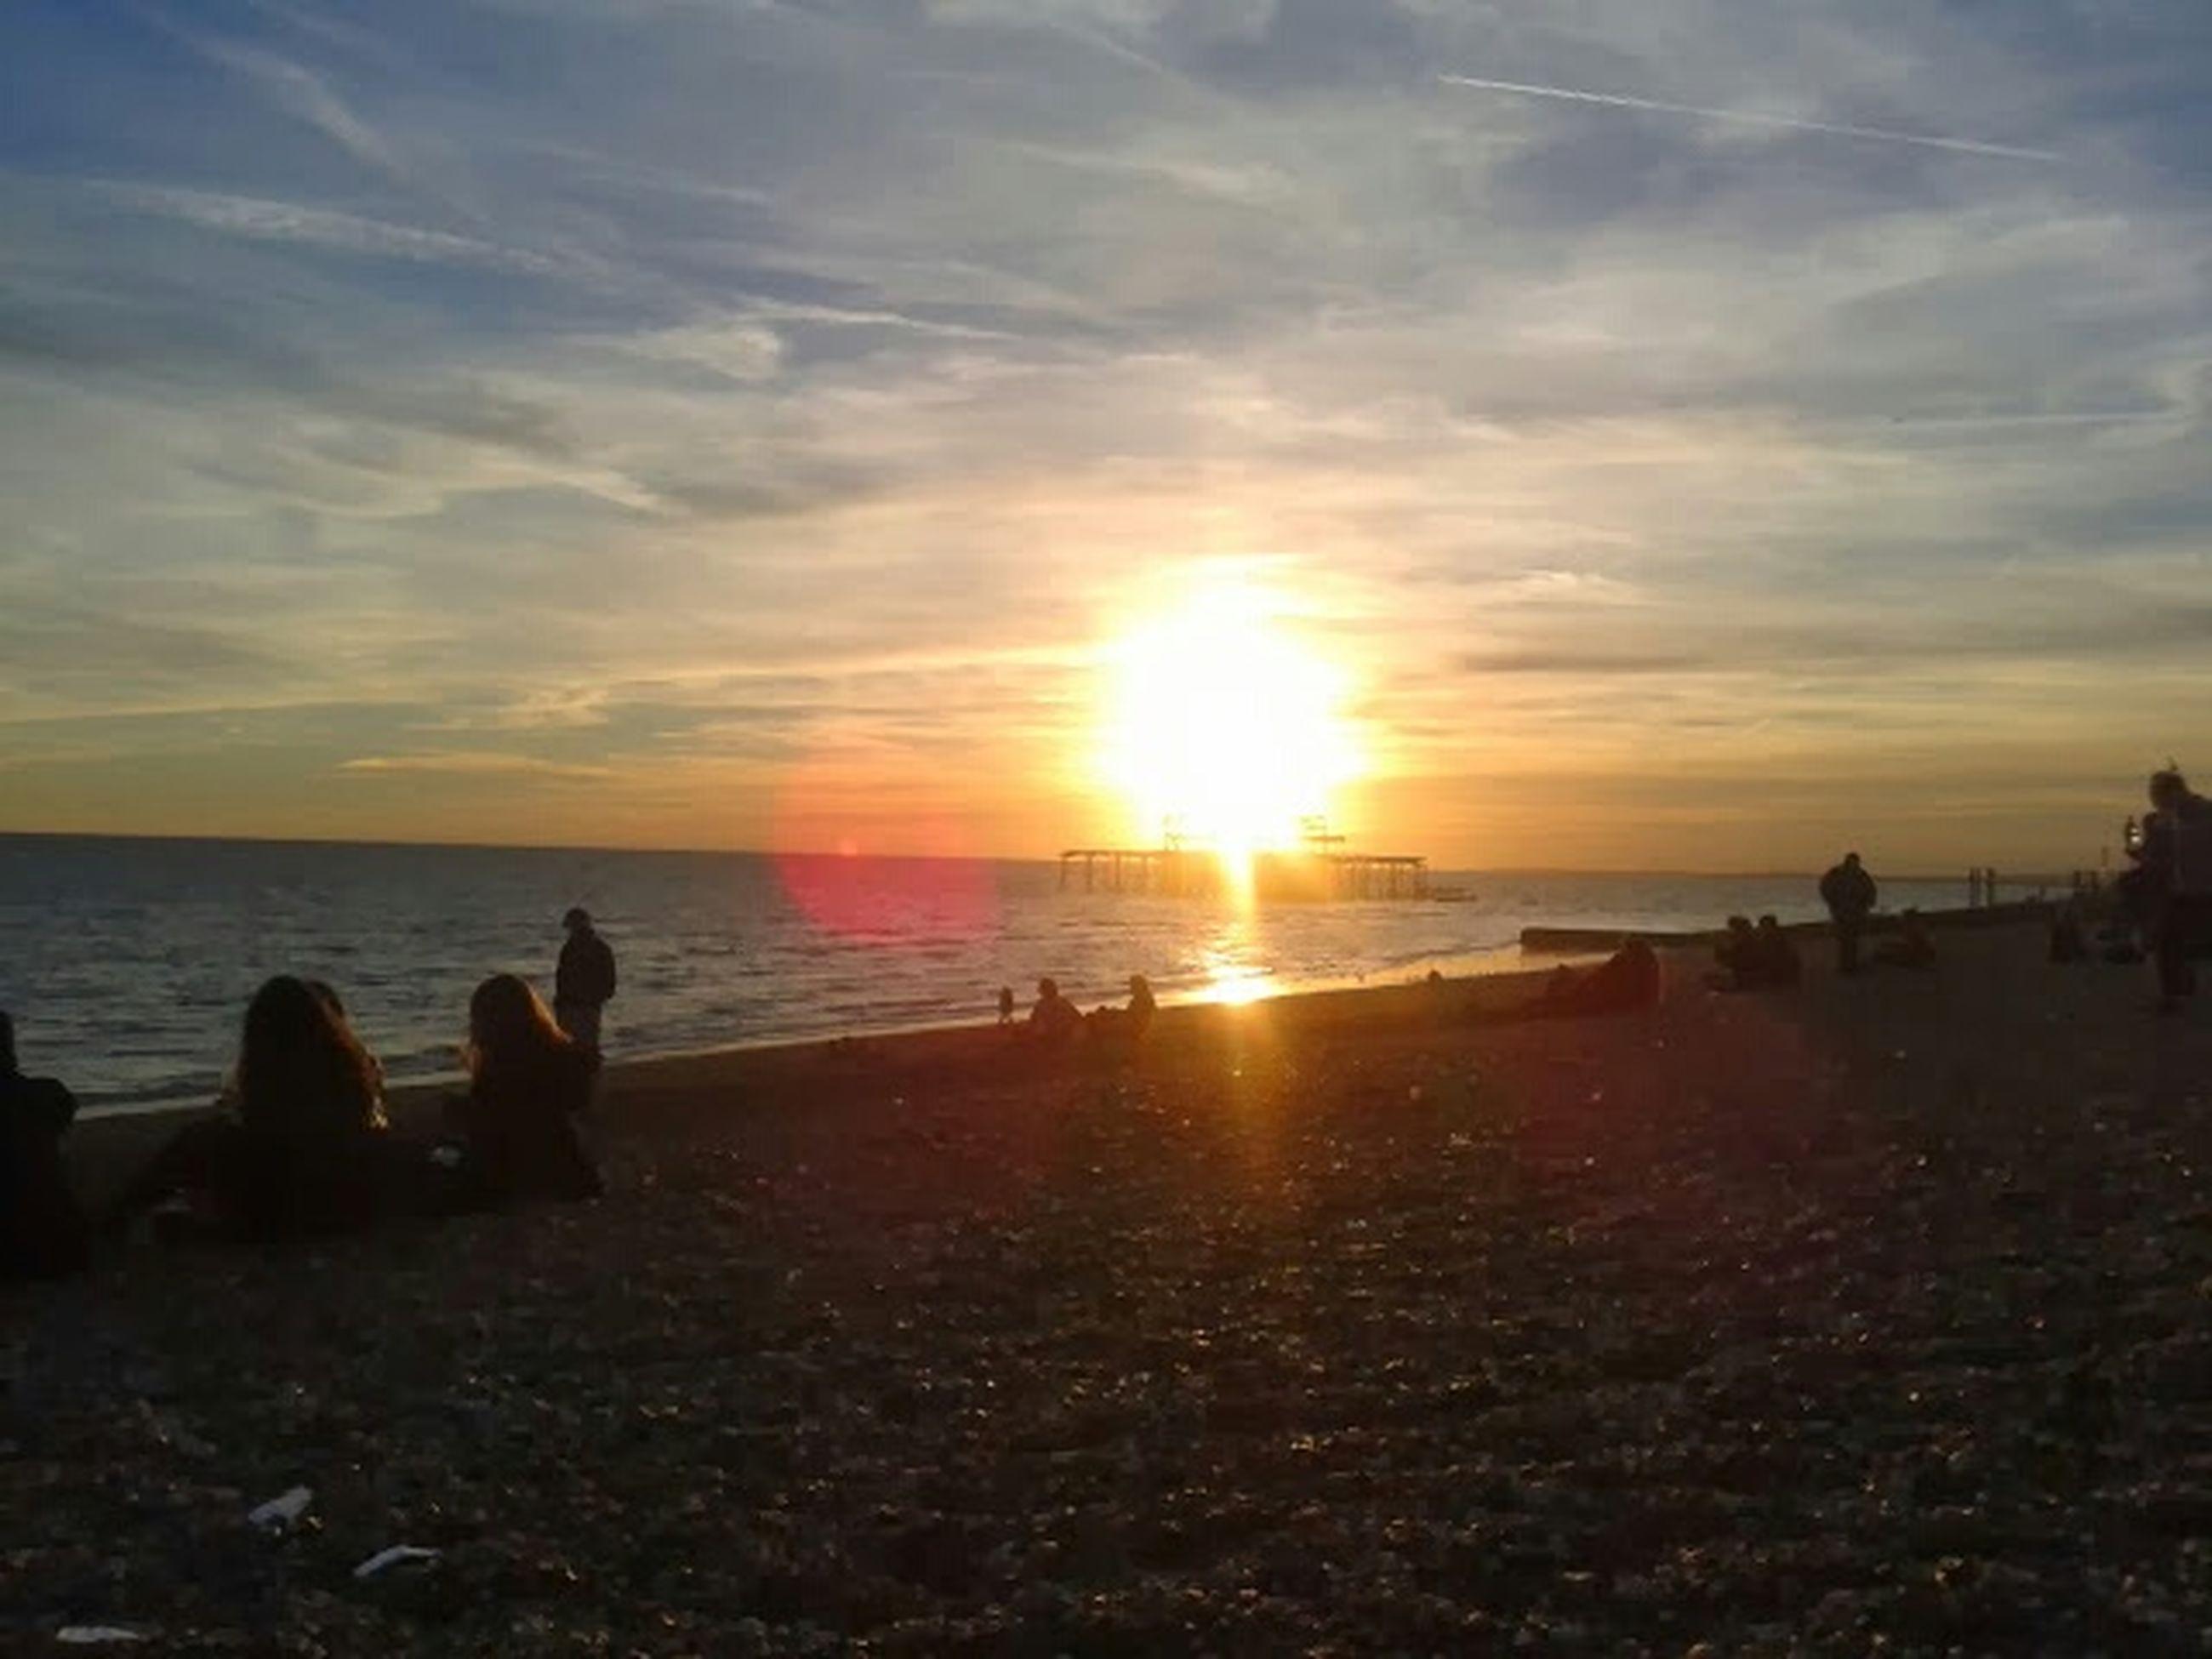 sea, water, sunset, horizon over water, beach, sky, scenics, sun, shore, beauty in nature, tranquil scene, tranquility, cloud - sky, silhouette, nature, idyllic, sunlight, incidental people, orange color